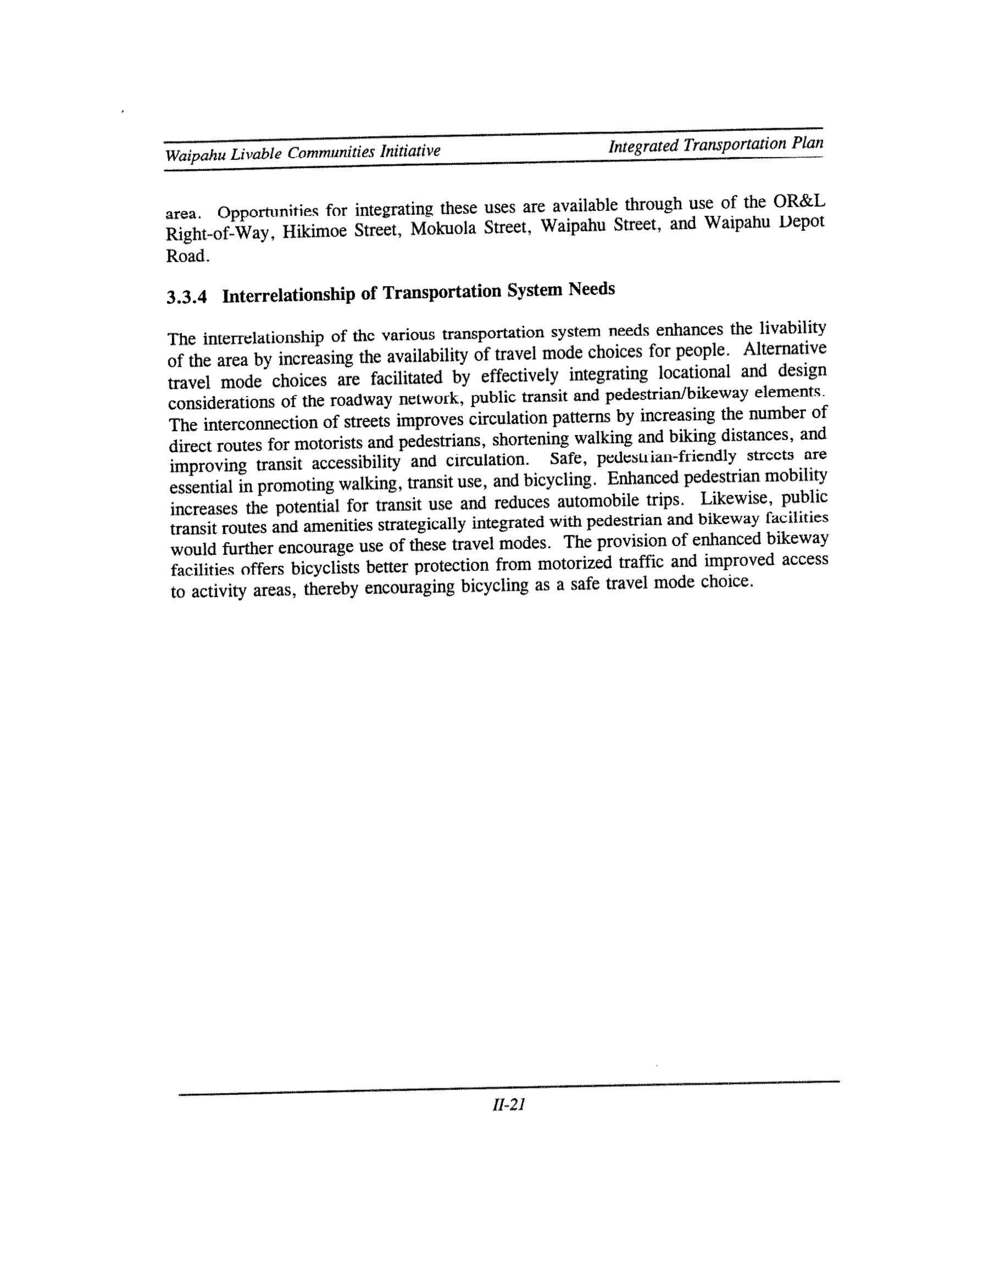 160531_WaipahuLivableCommunities(1998)_Page_036.jpg